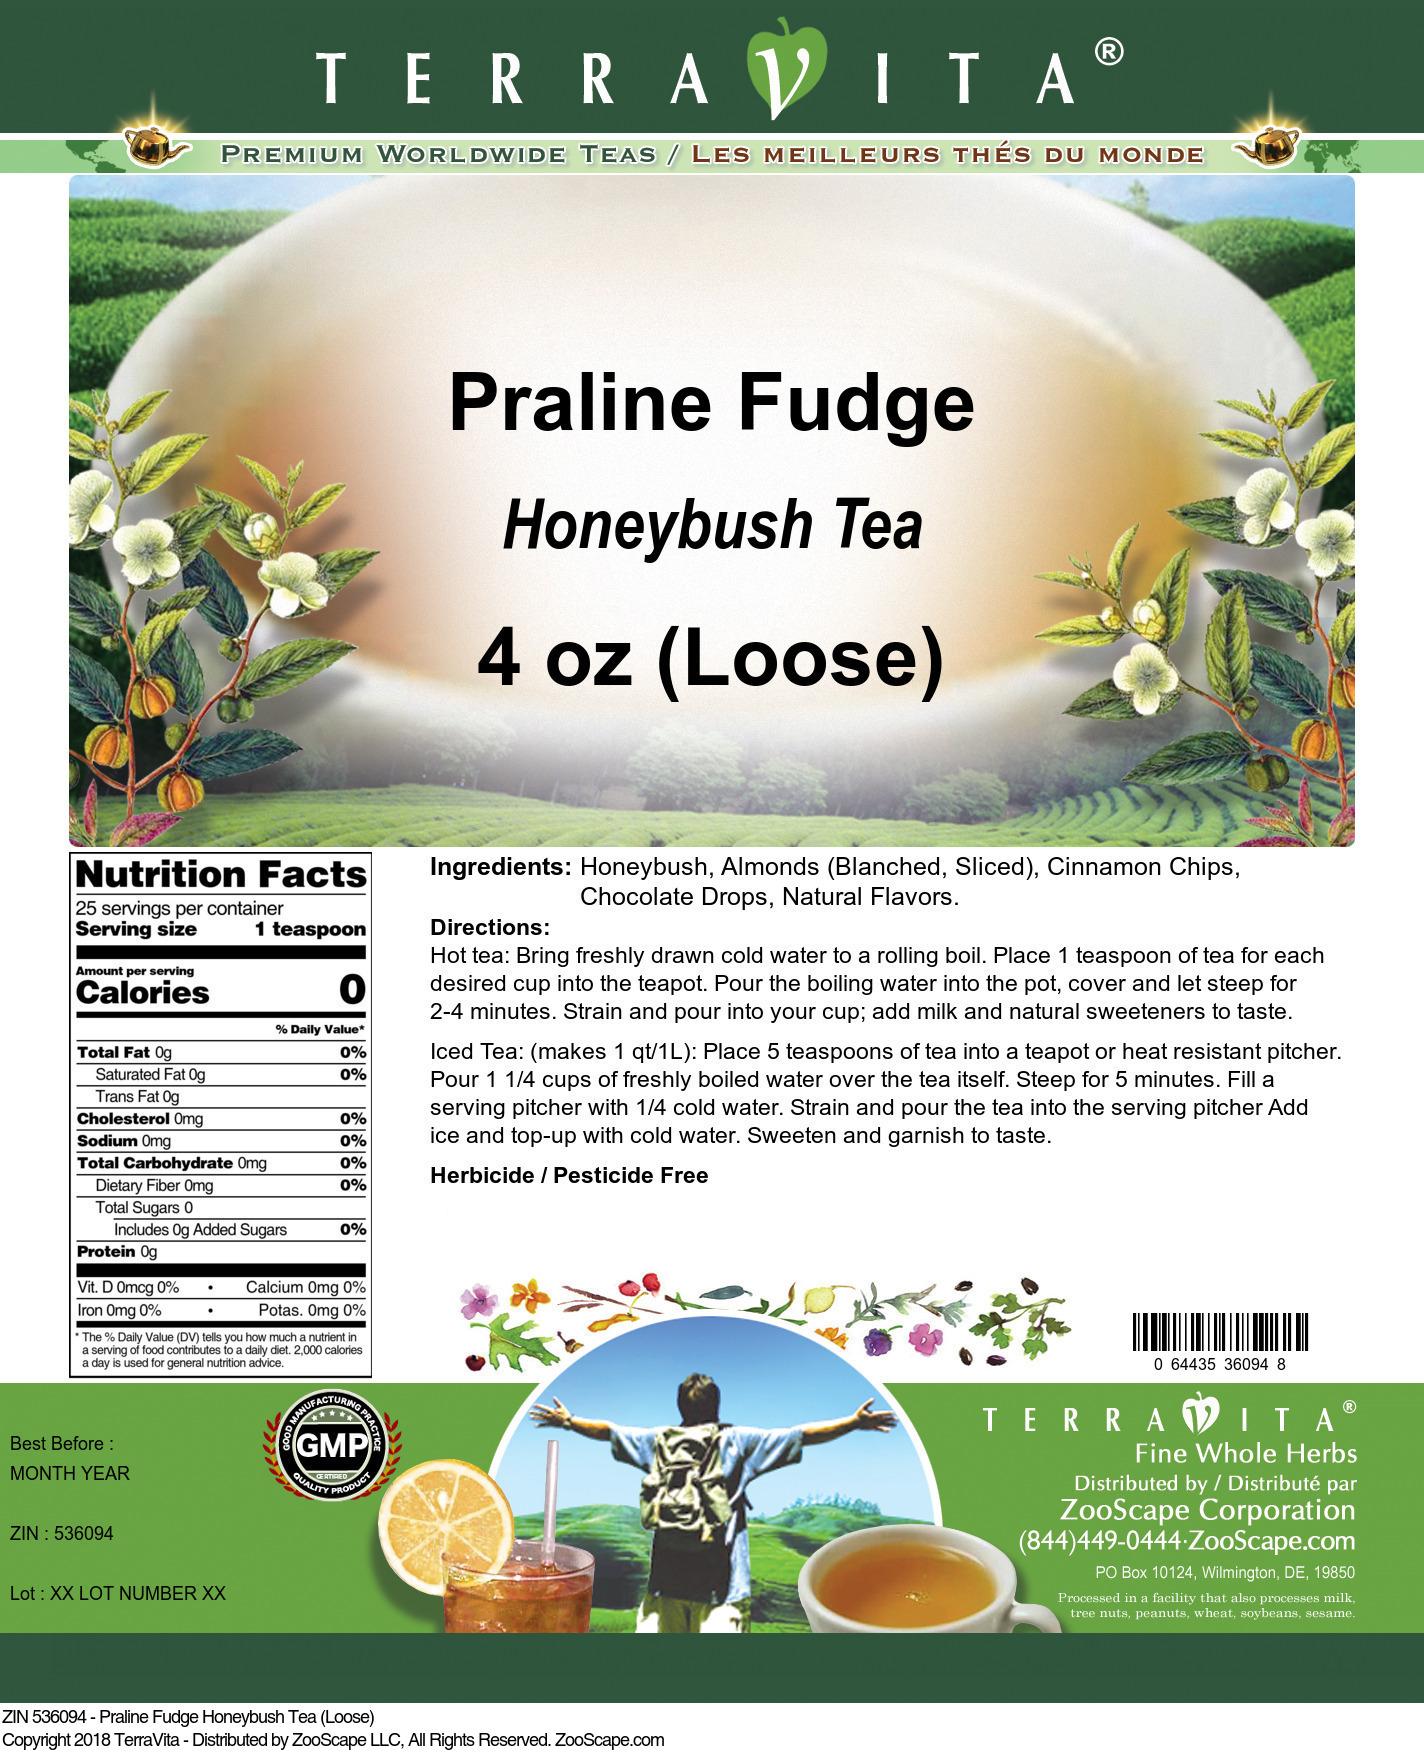 Praline Fudge Honeybush Tea